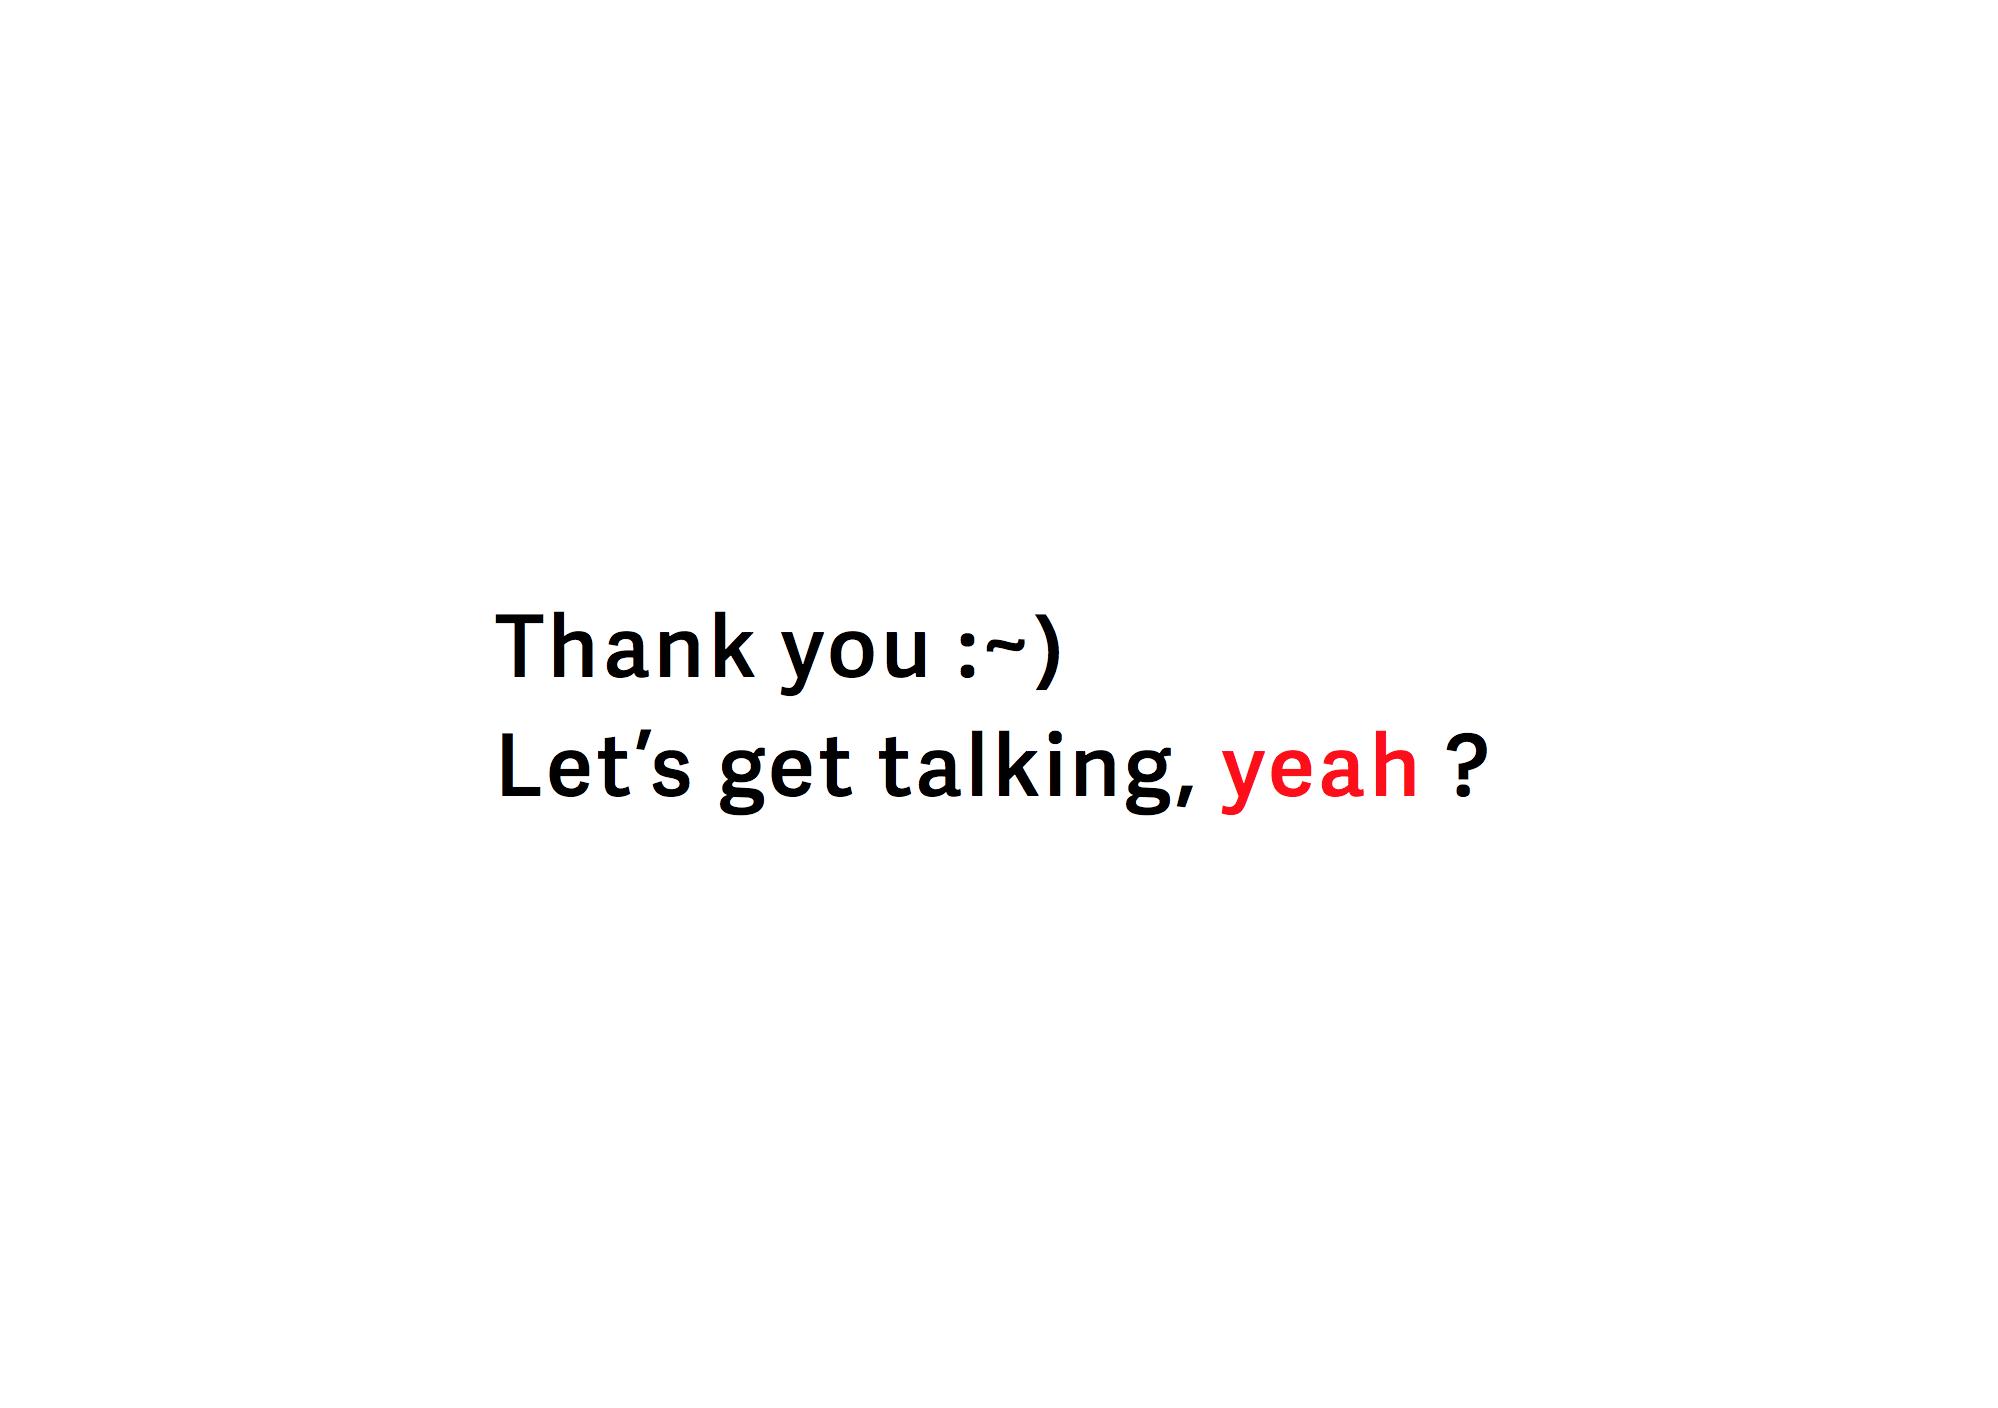 gdfs-lets-get-talking13